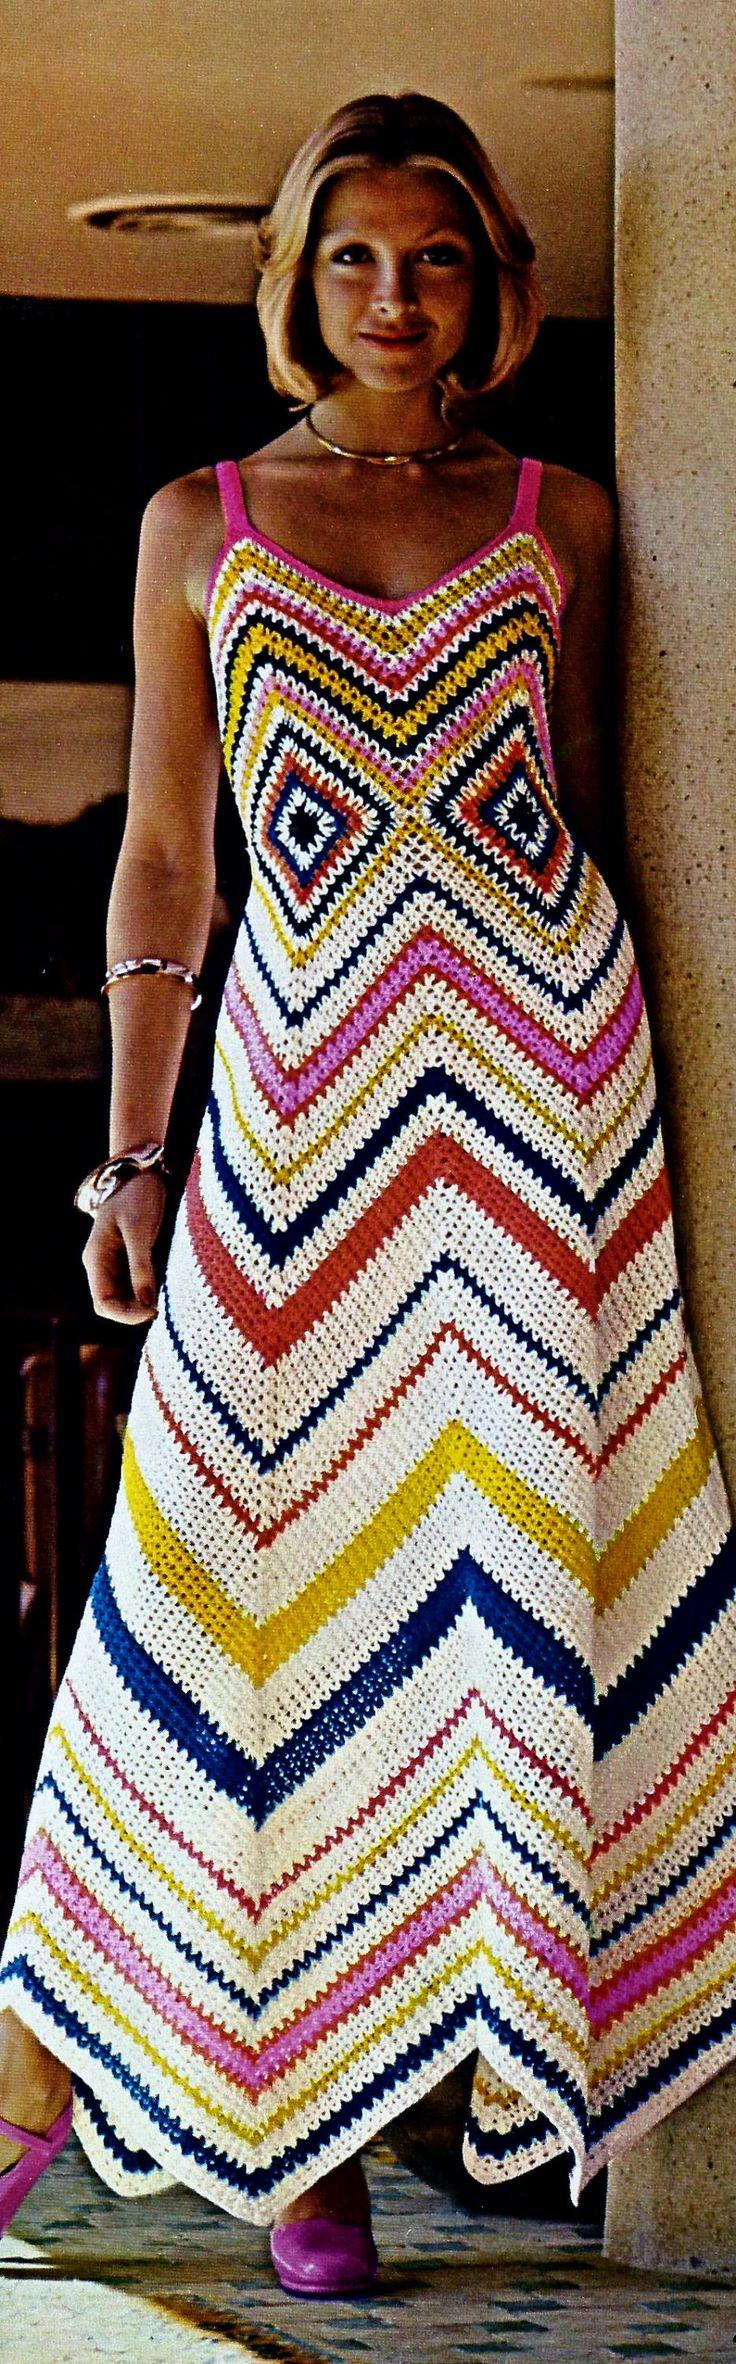 Chevron Crochet Dress Vintage Crochet Pattern Download by MomentsInTwine on Etsy